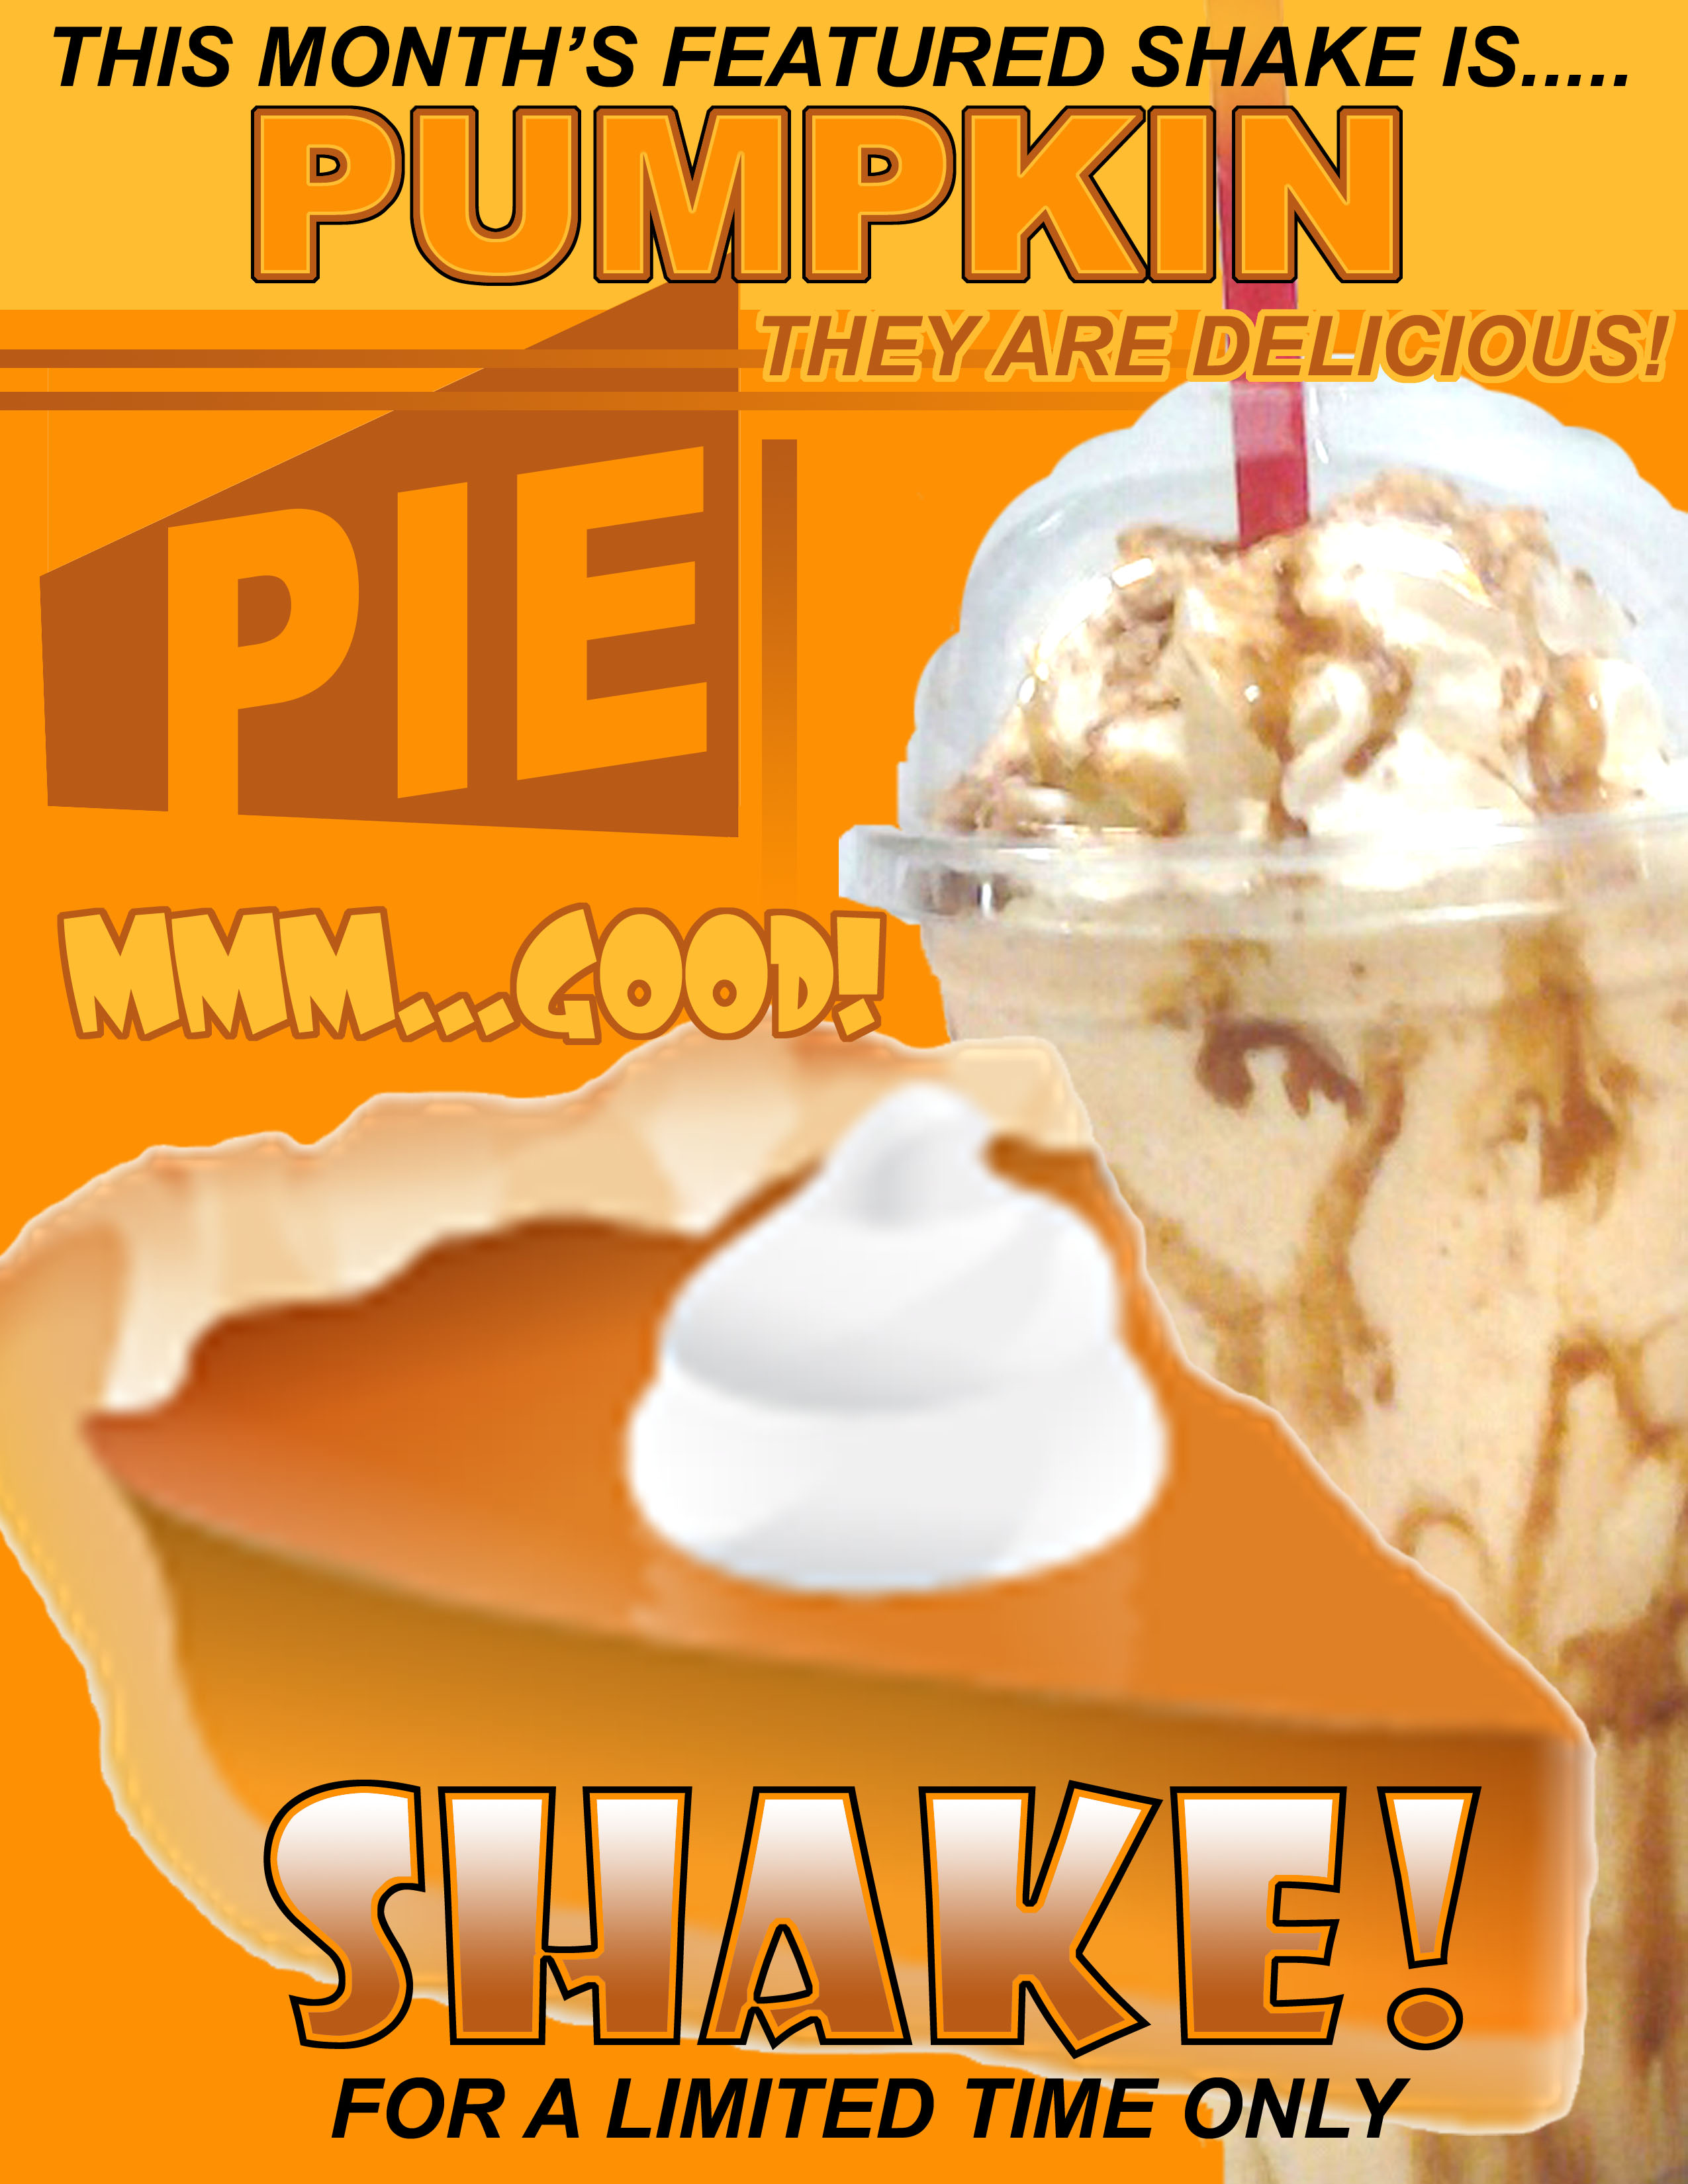 Featured Shake